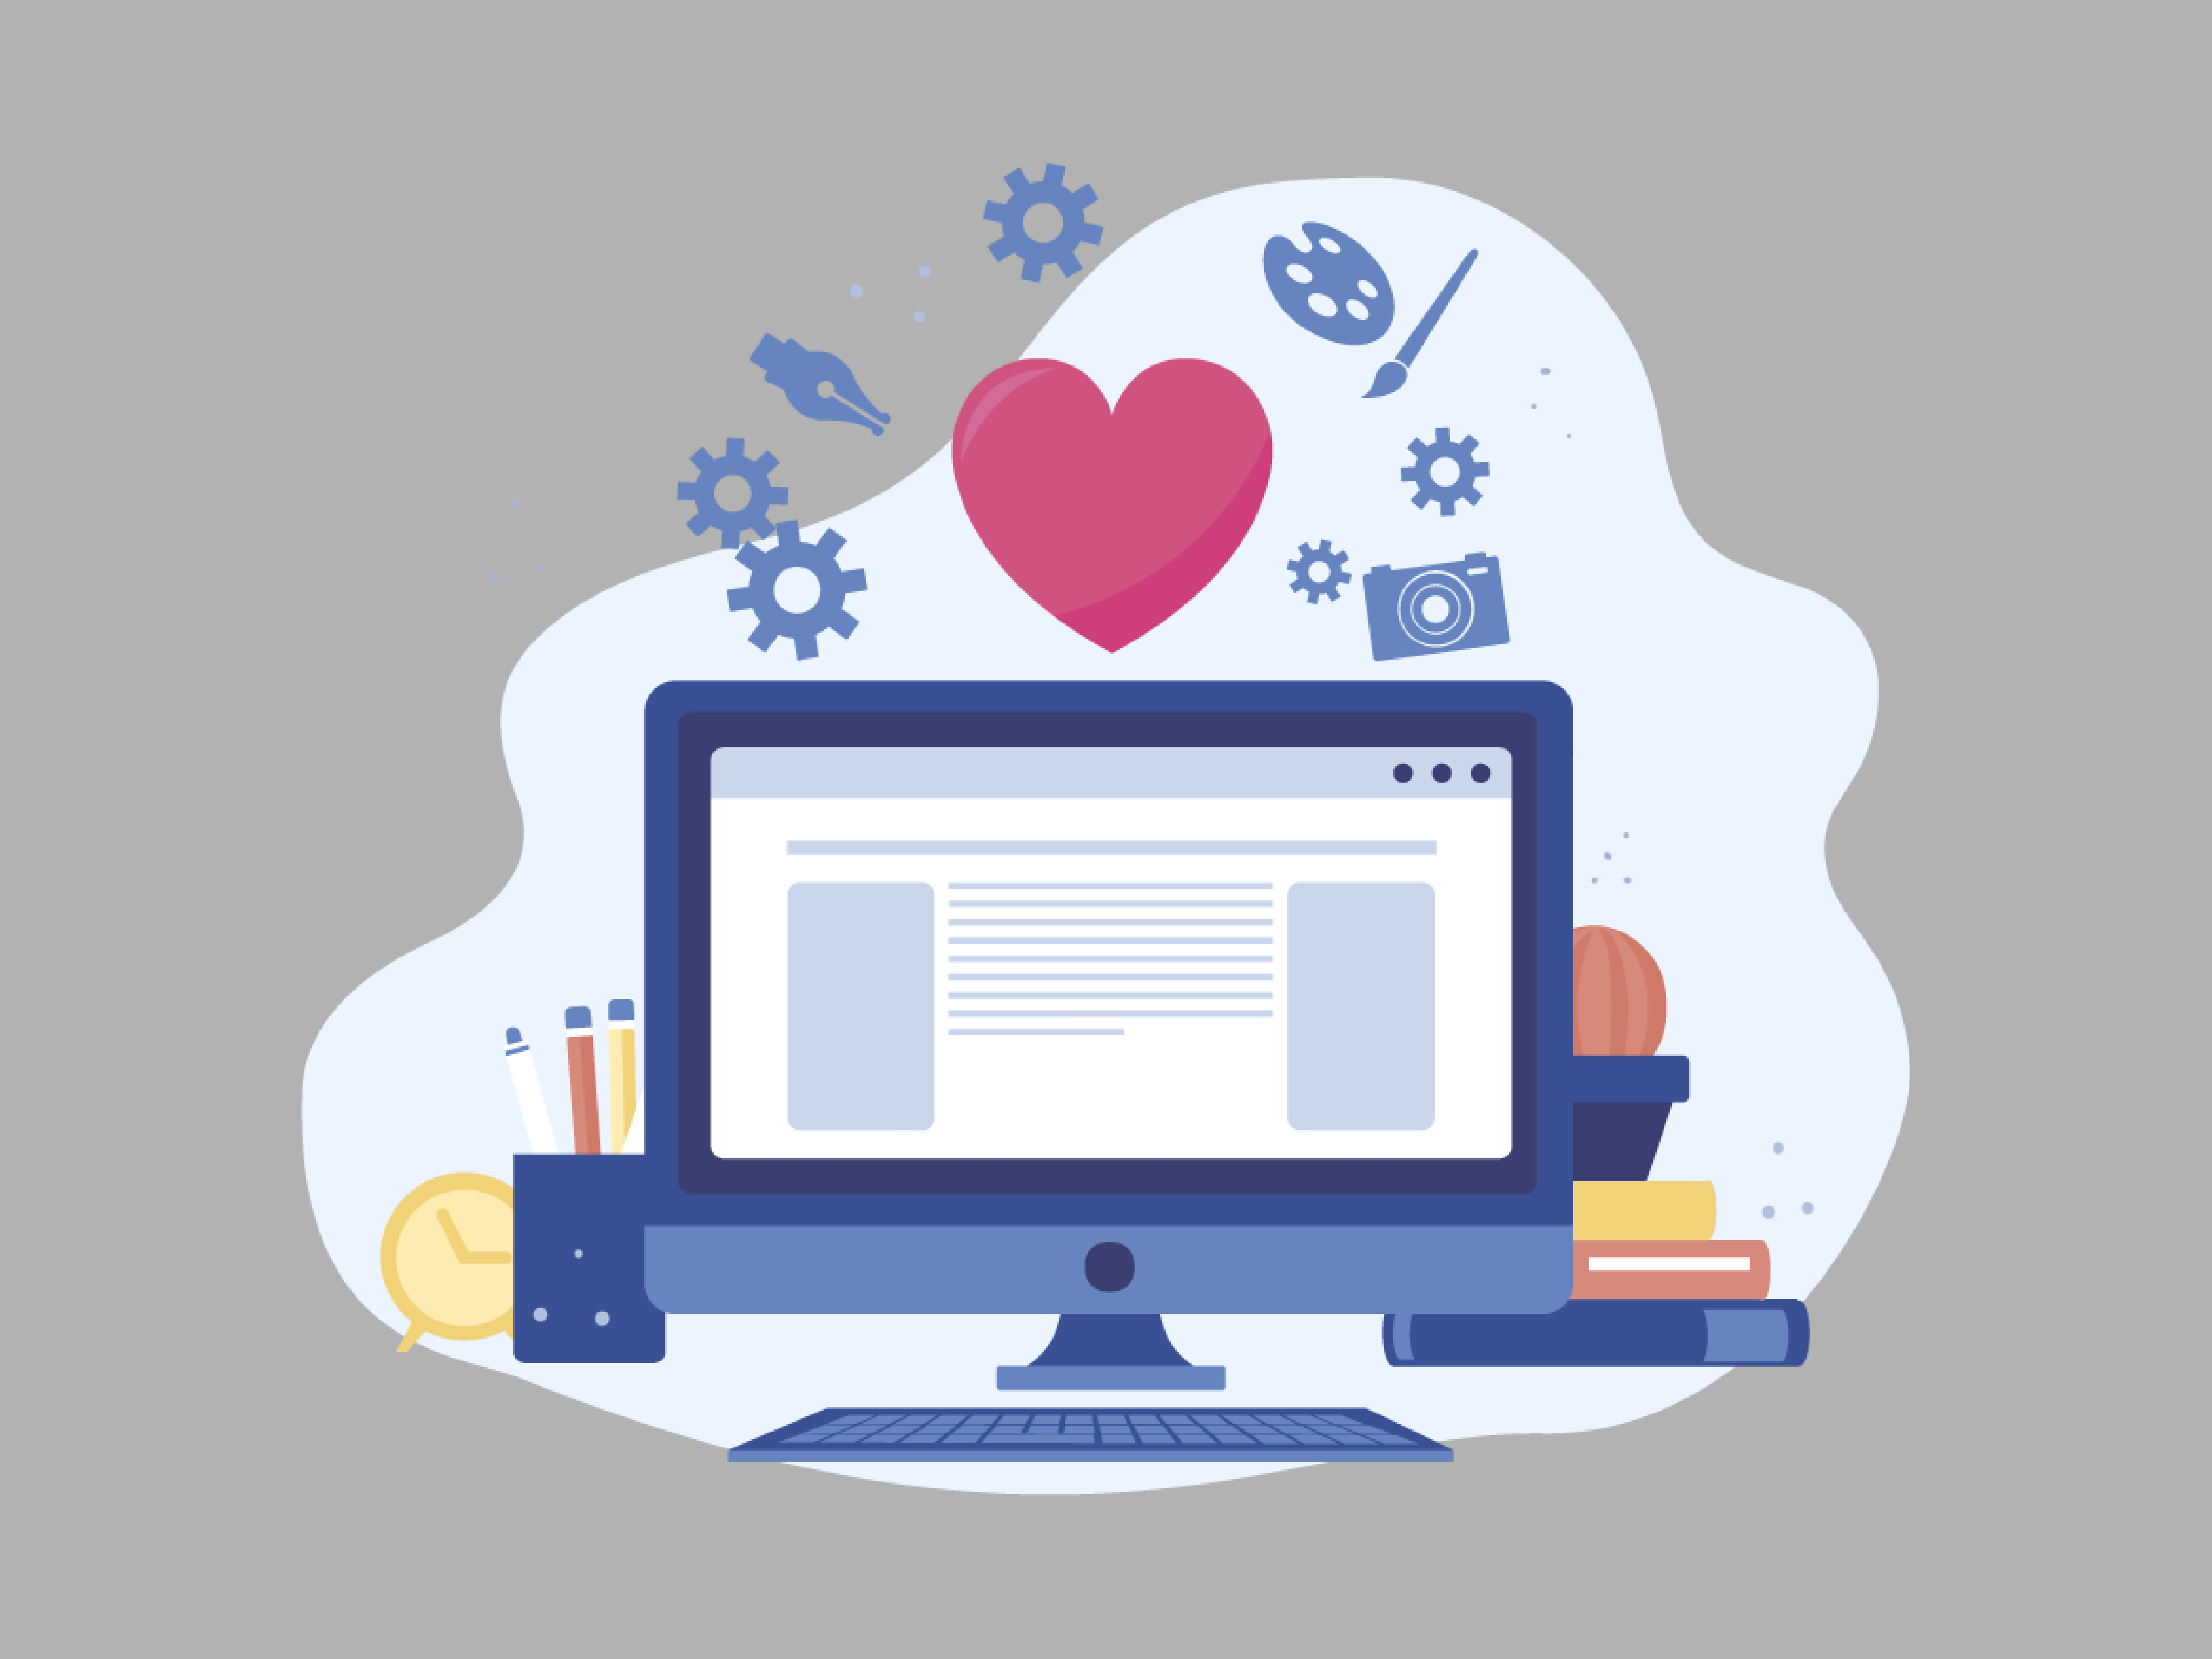 10 reasons we love HubSpot for education marketing